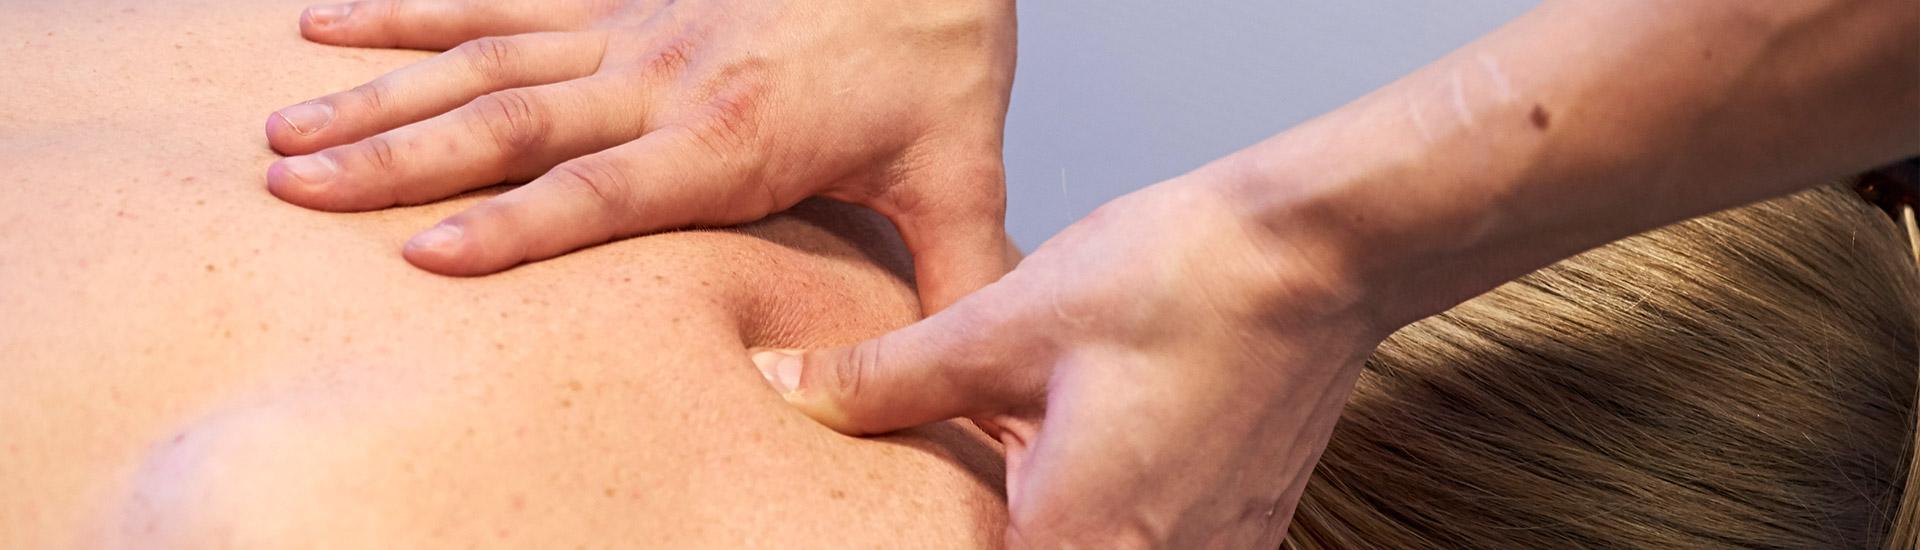 rygbehandling fysioterapeut Klinik Åboulevard